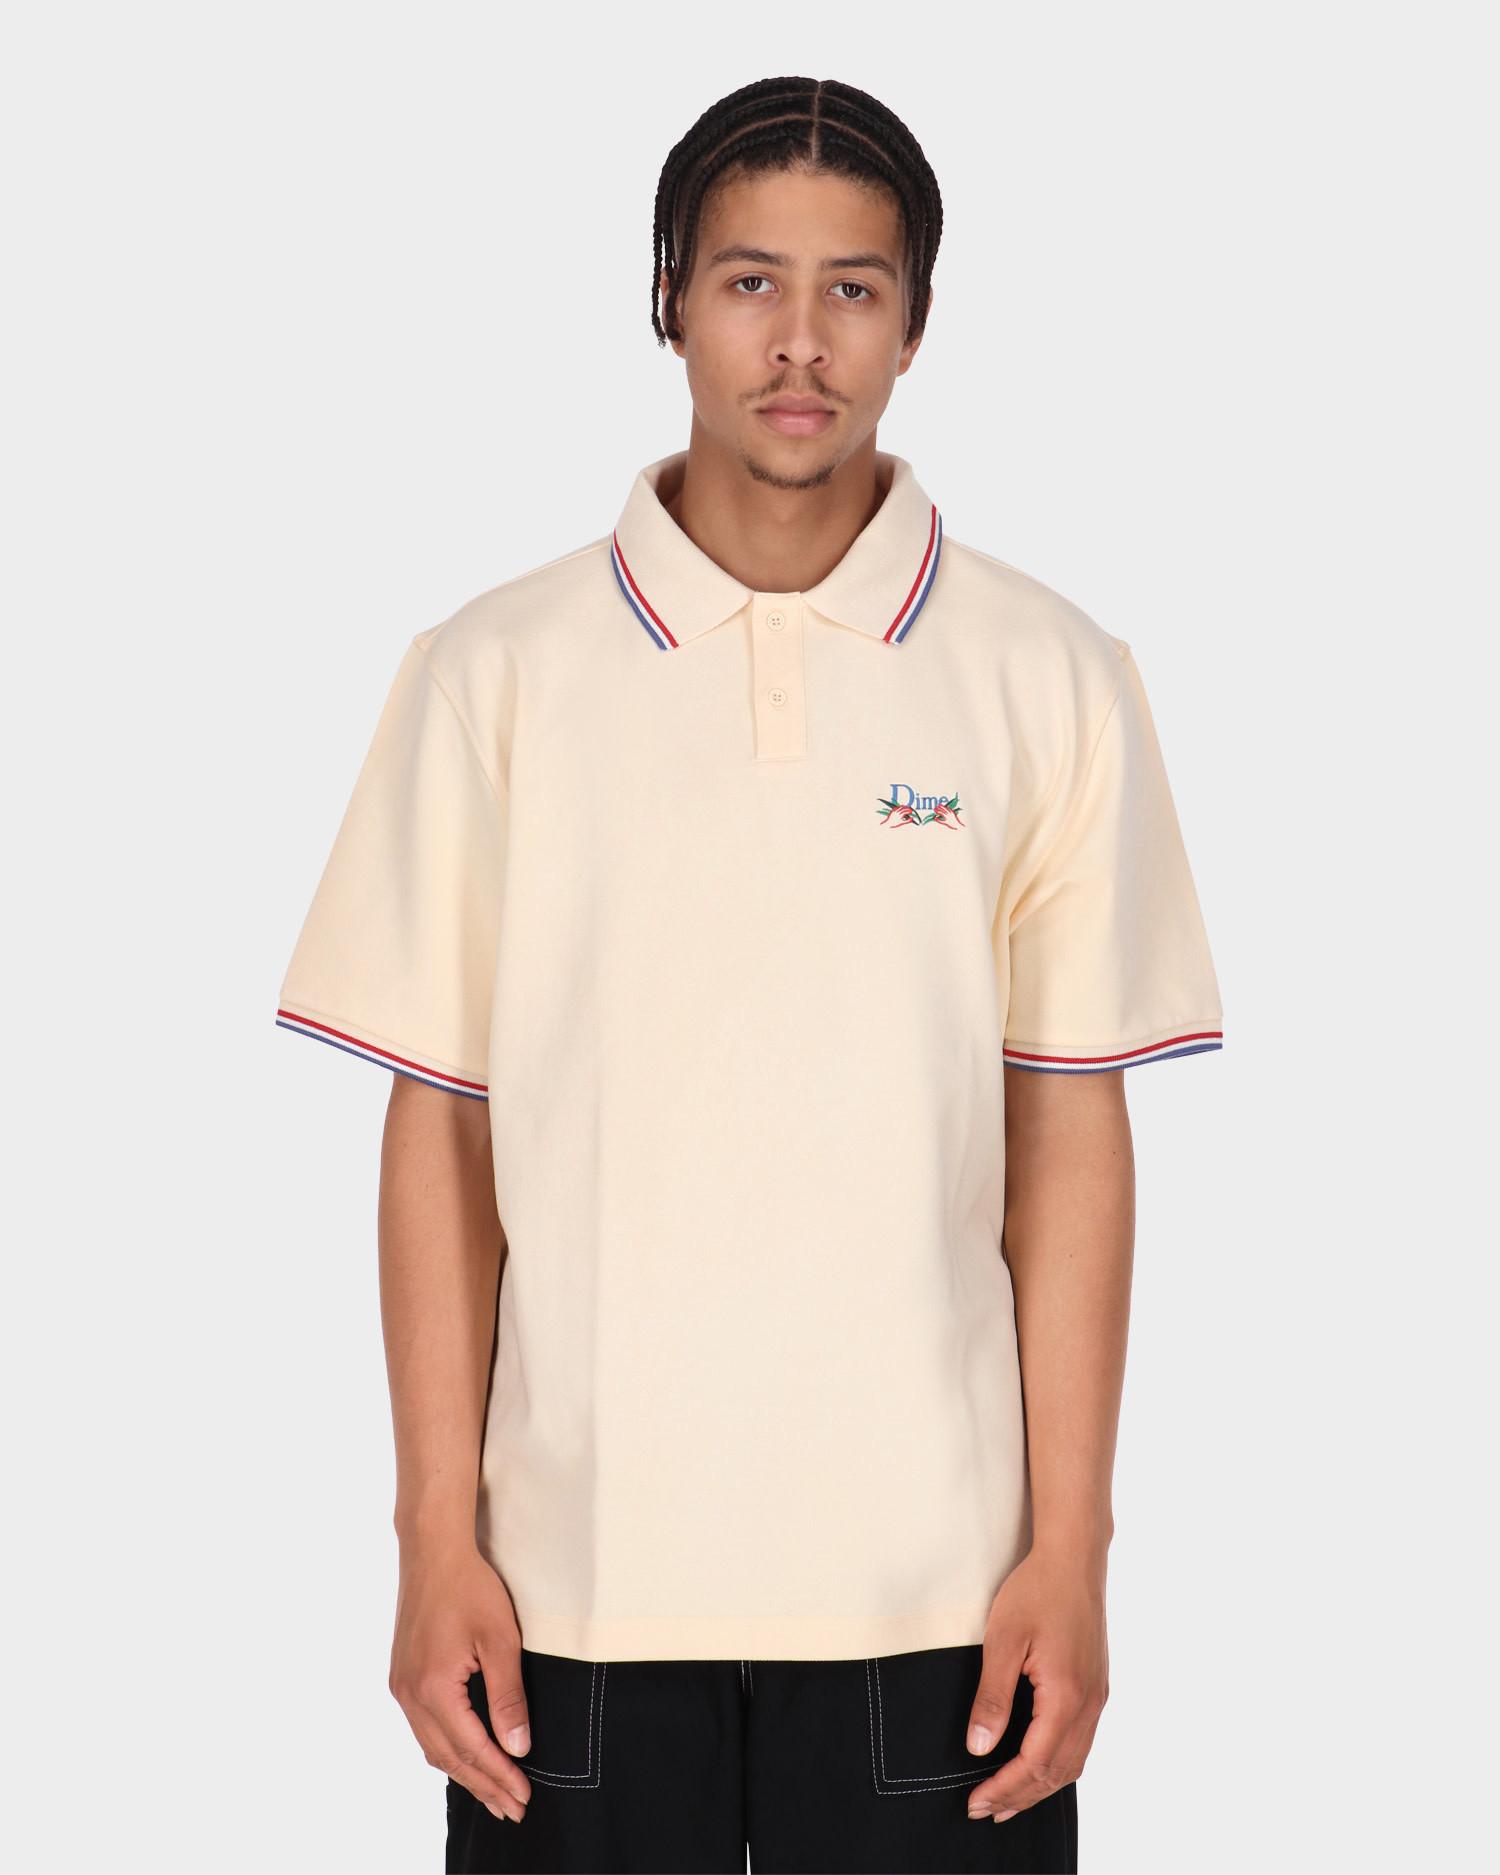 Dime Grass Polo Shirt Cream